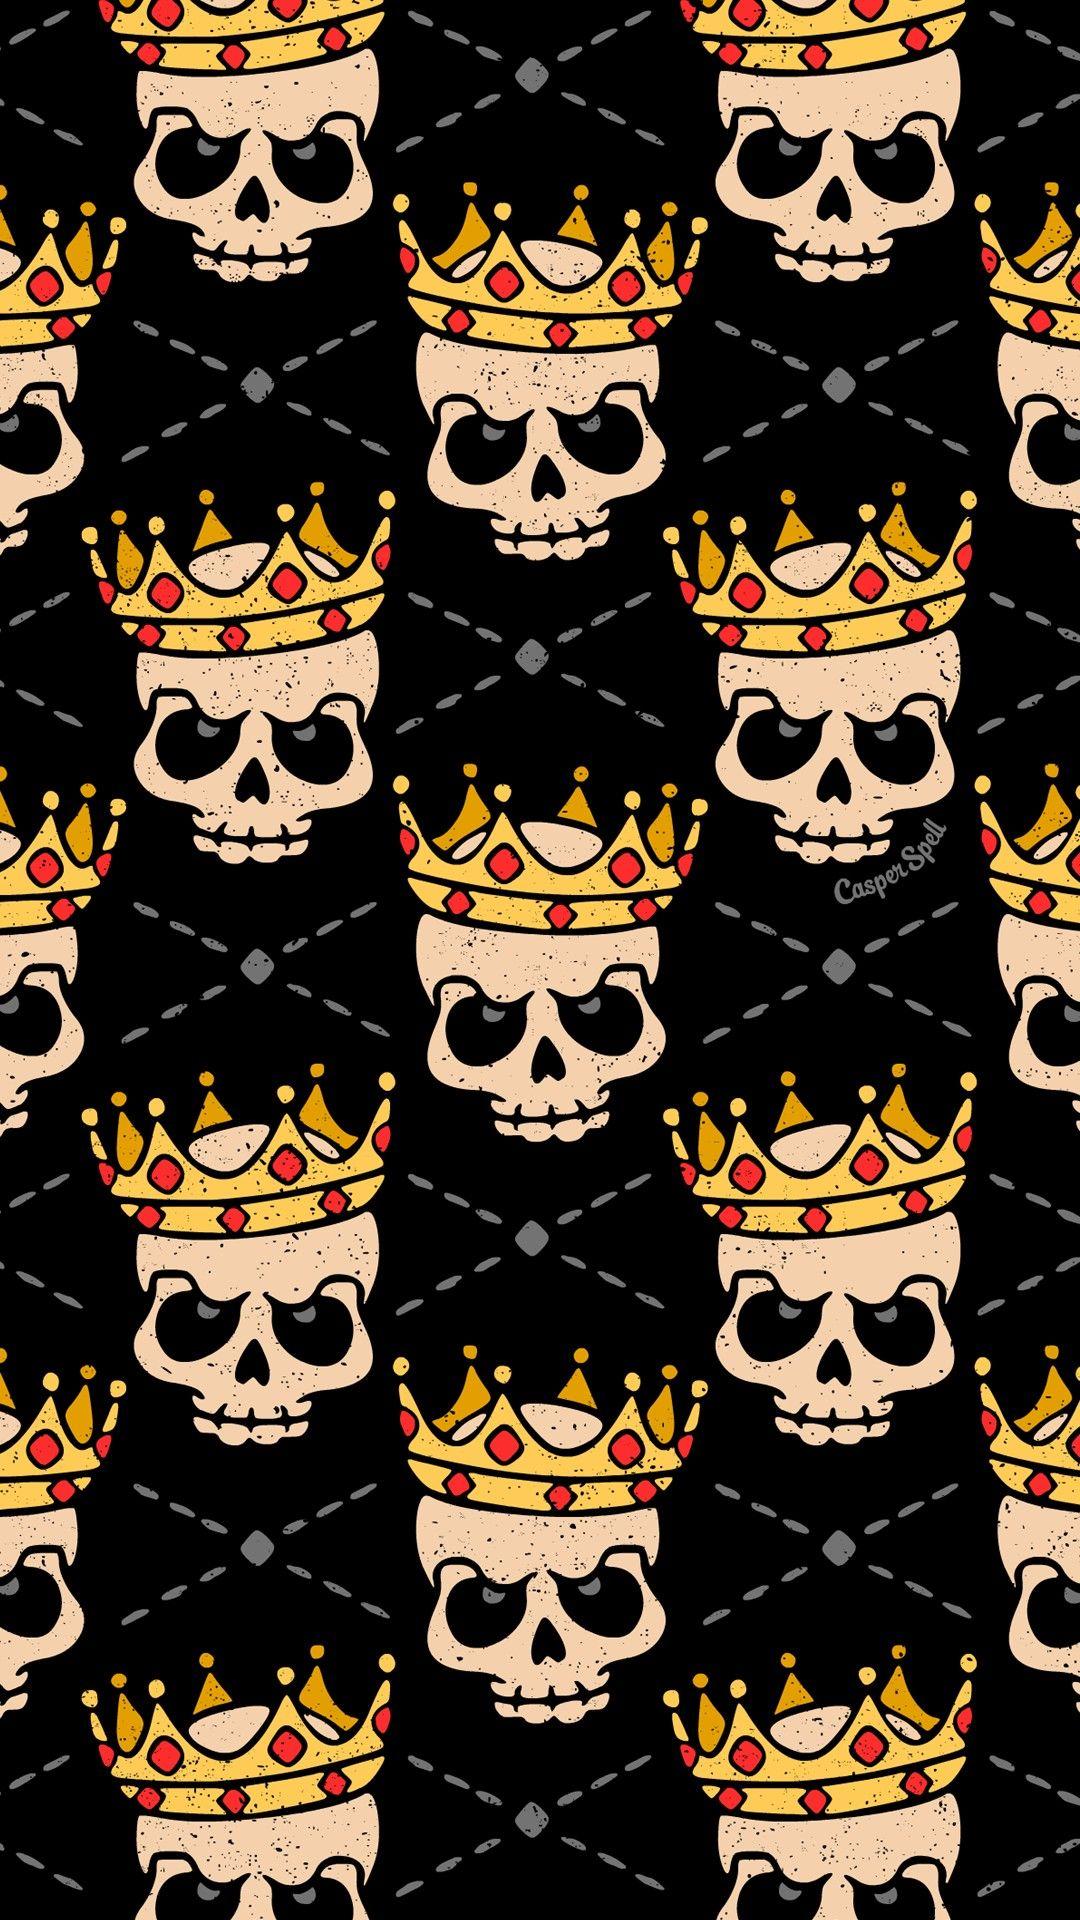 Skull Royal Royalty King Repeat Pattern Wallpaper